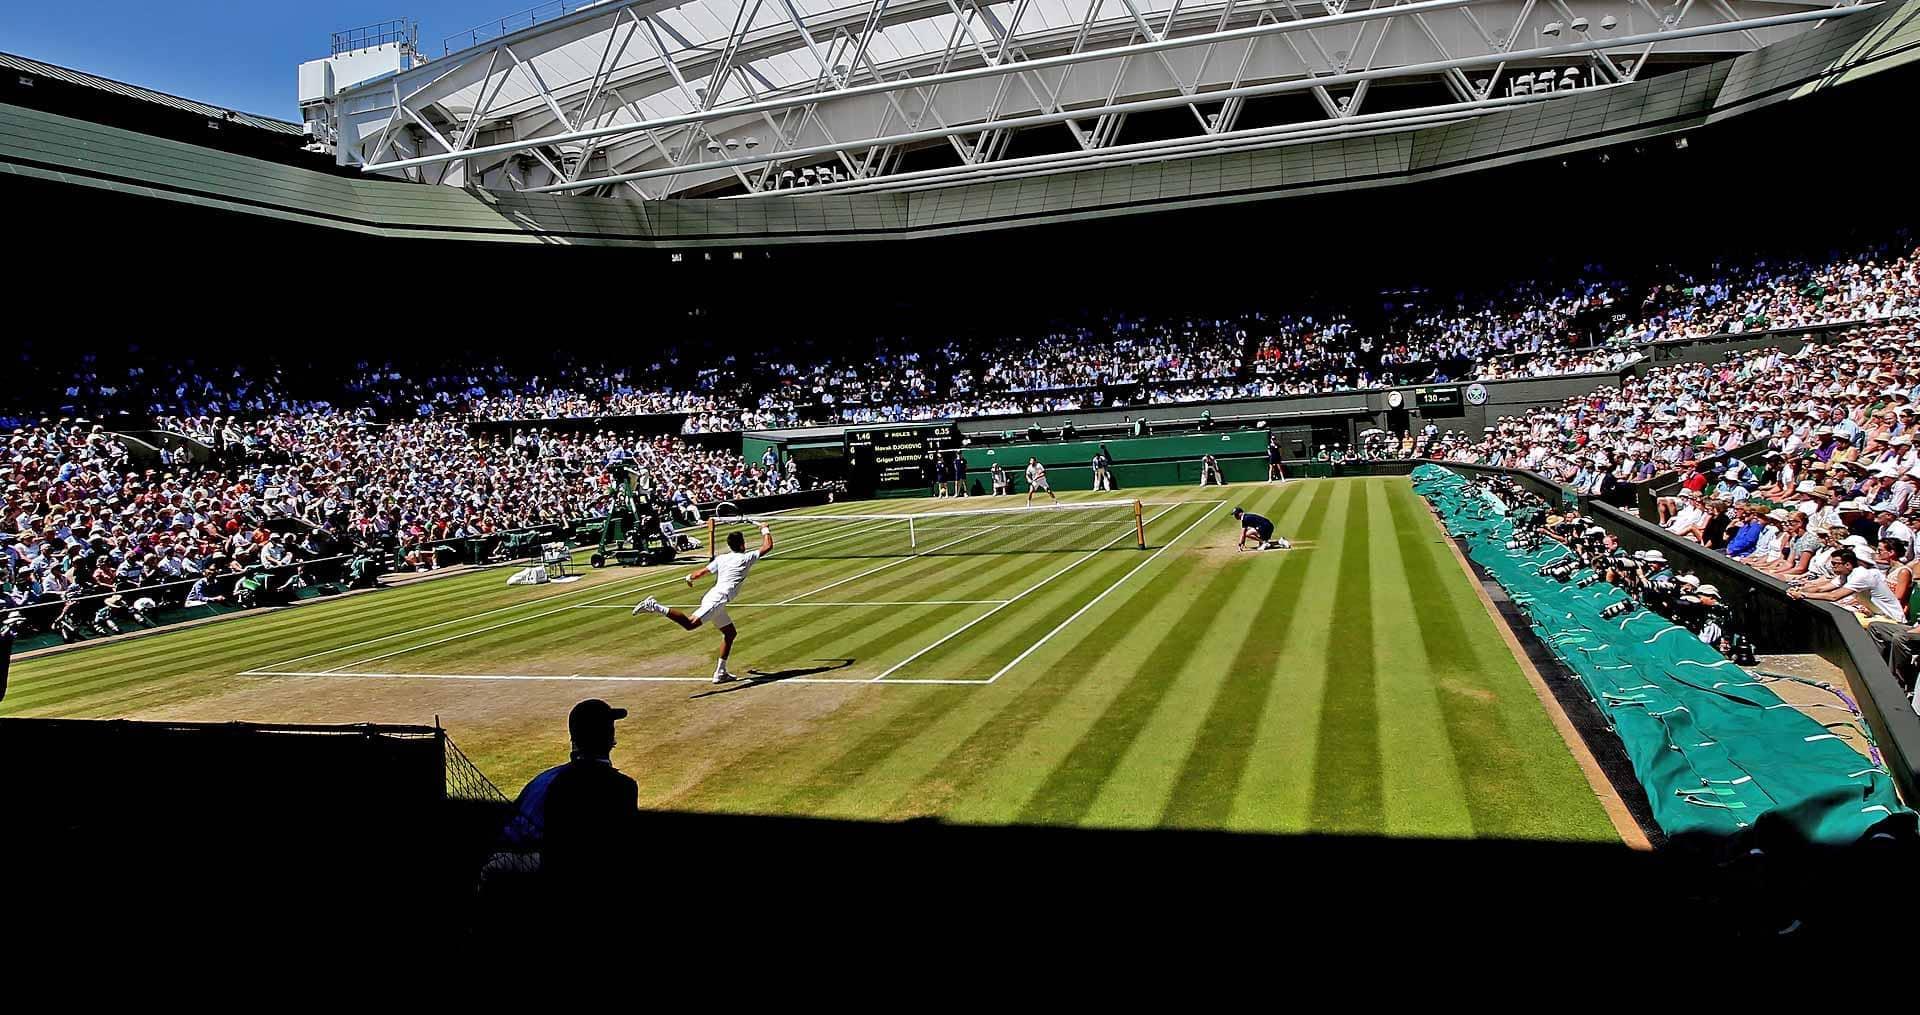 A photograph taken for the Wimbledon tennis championships